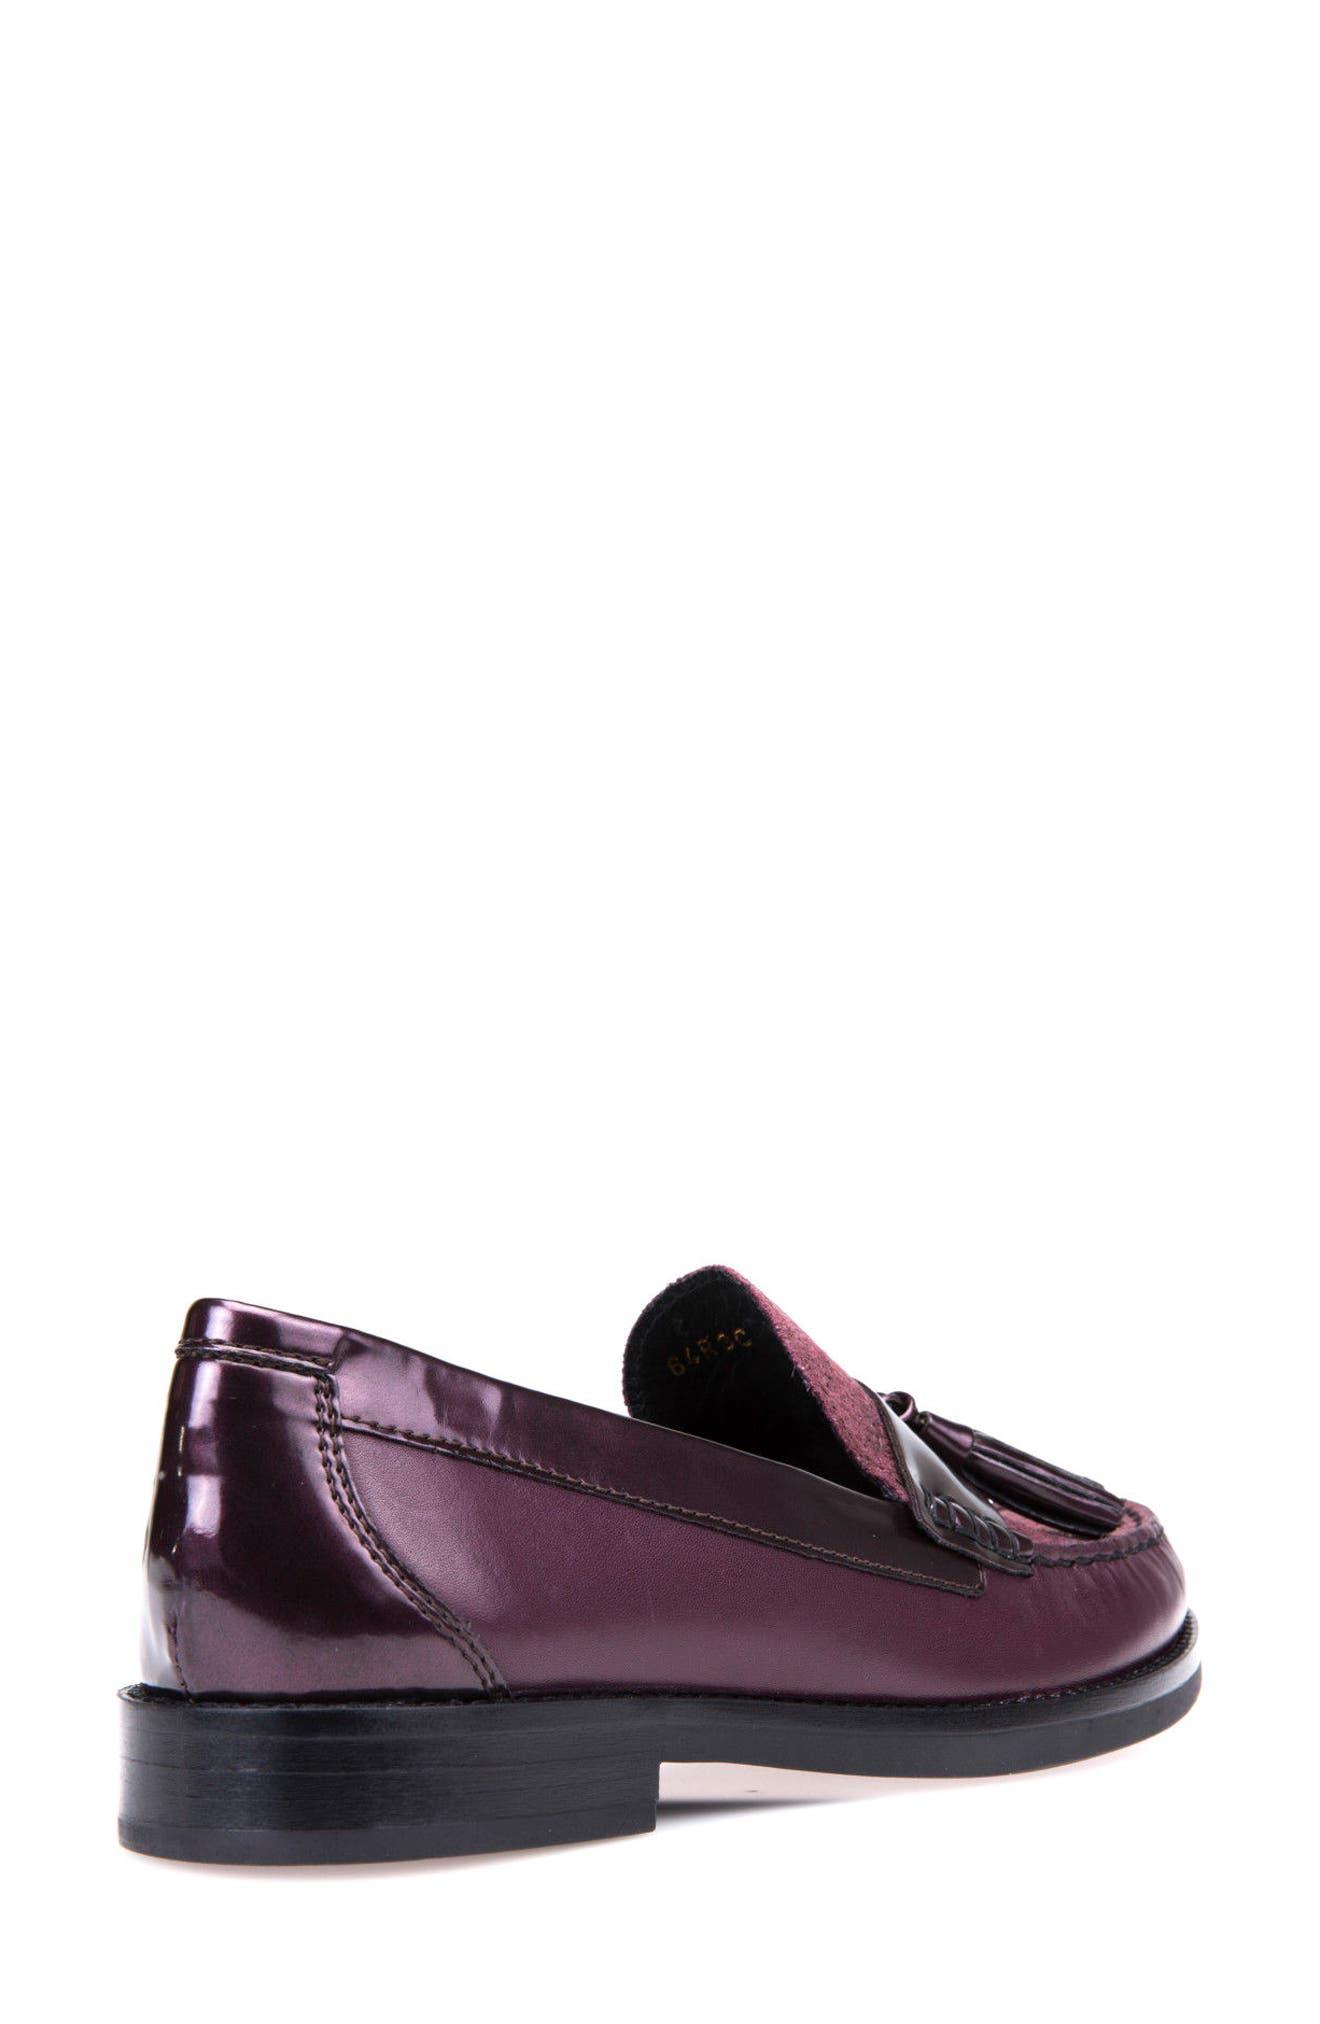 Promethea Loafer,                             Alternate thumbnail 3, color,                             Prune Leather